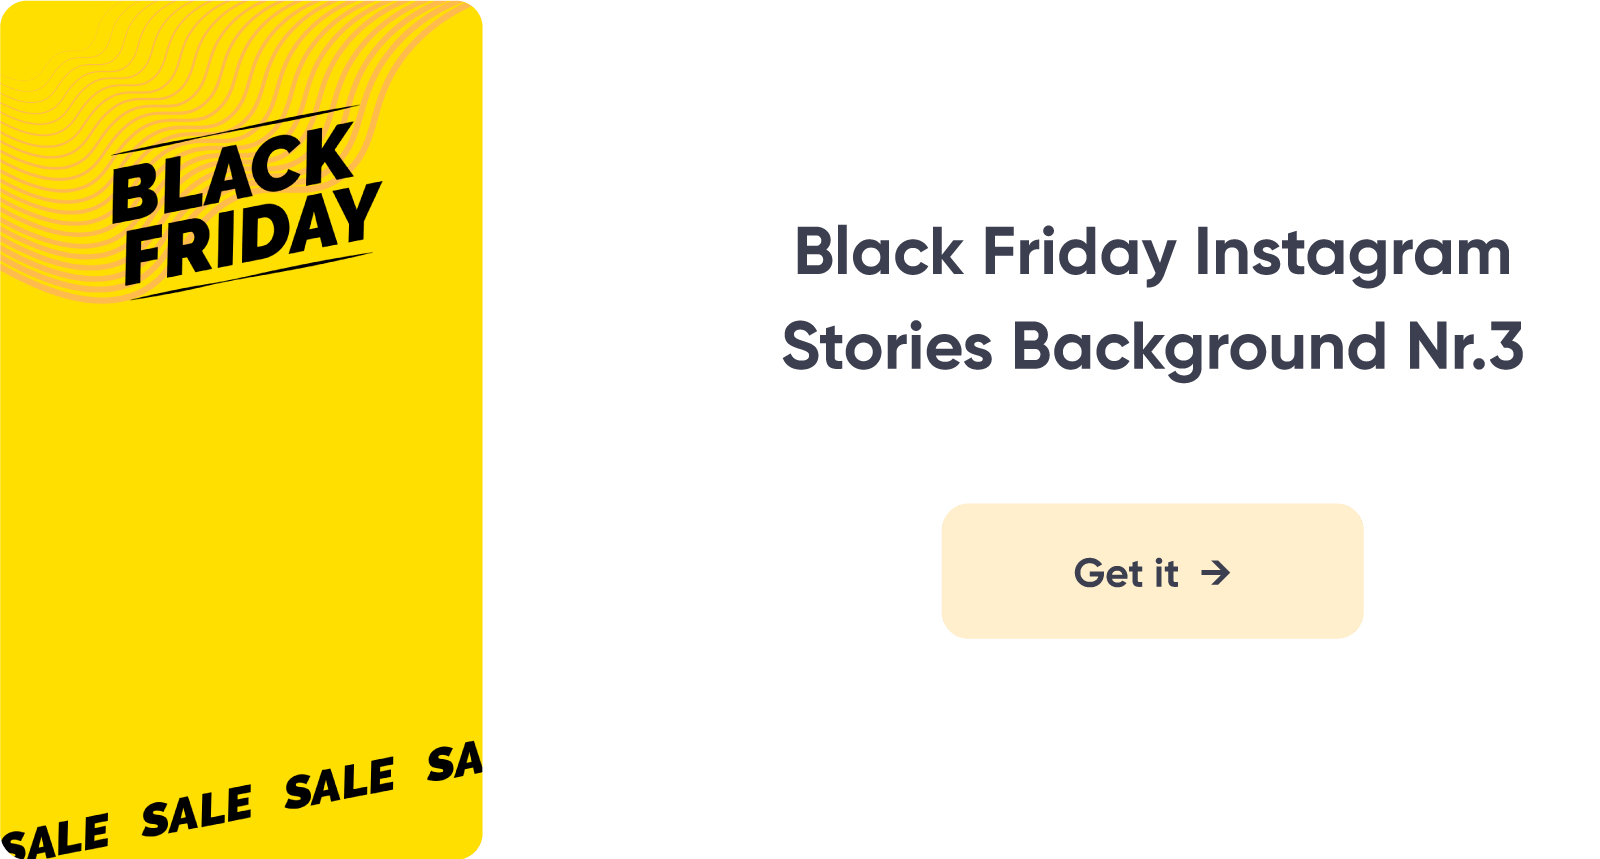 Black Friday Instagram Stories Background 3